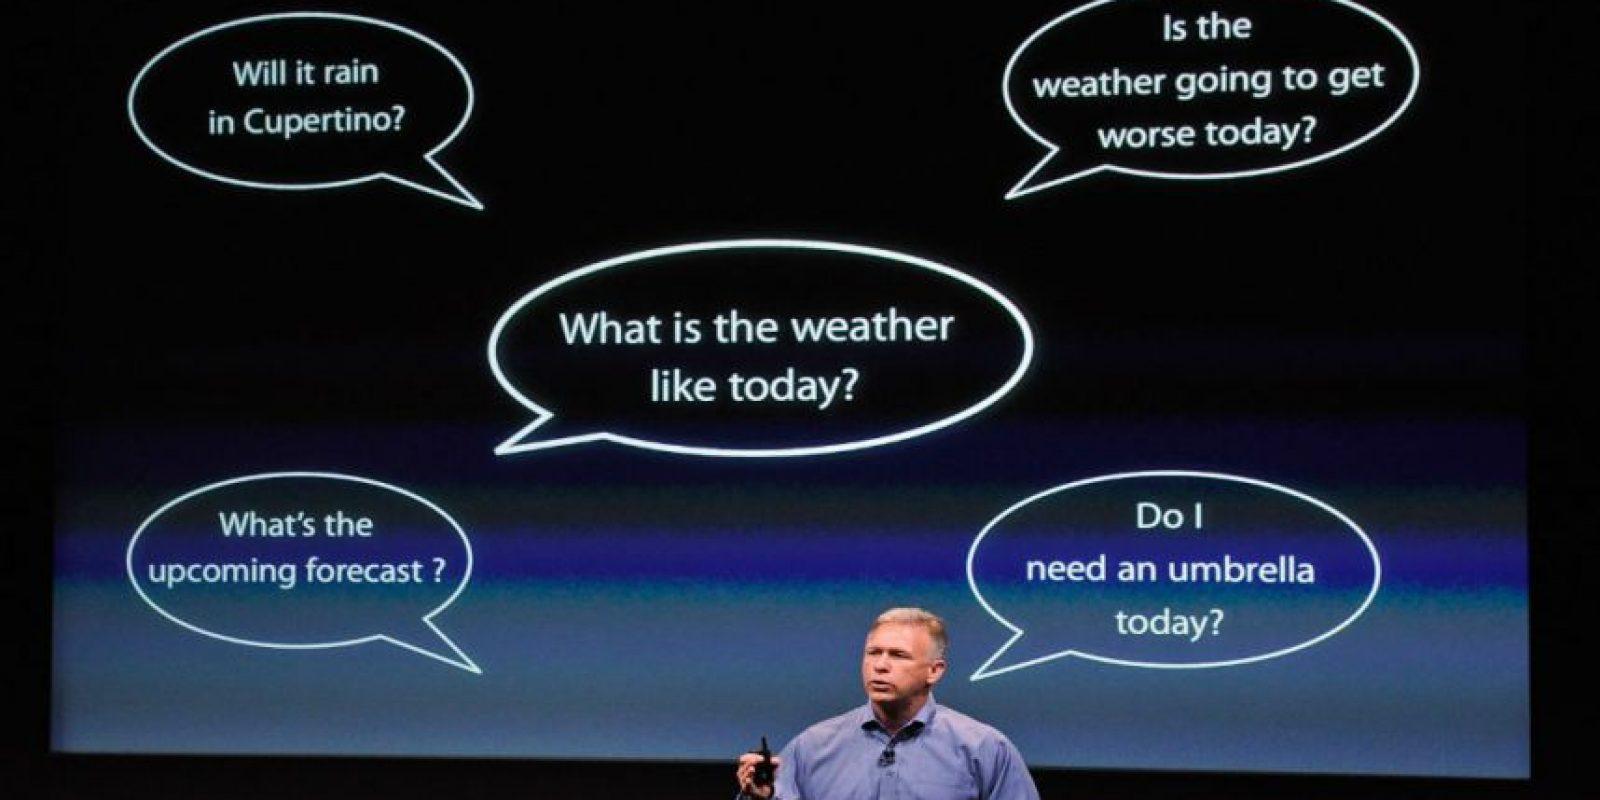 Kittlaus abandonó Apple en 2012. Foto:Getty Images